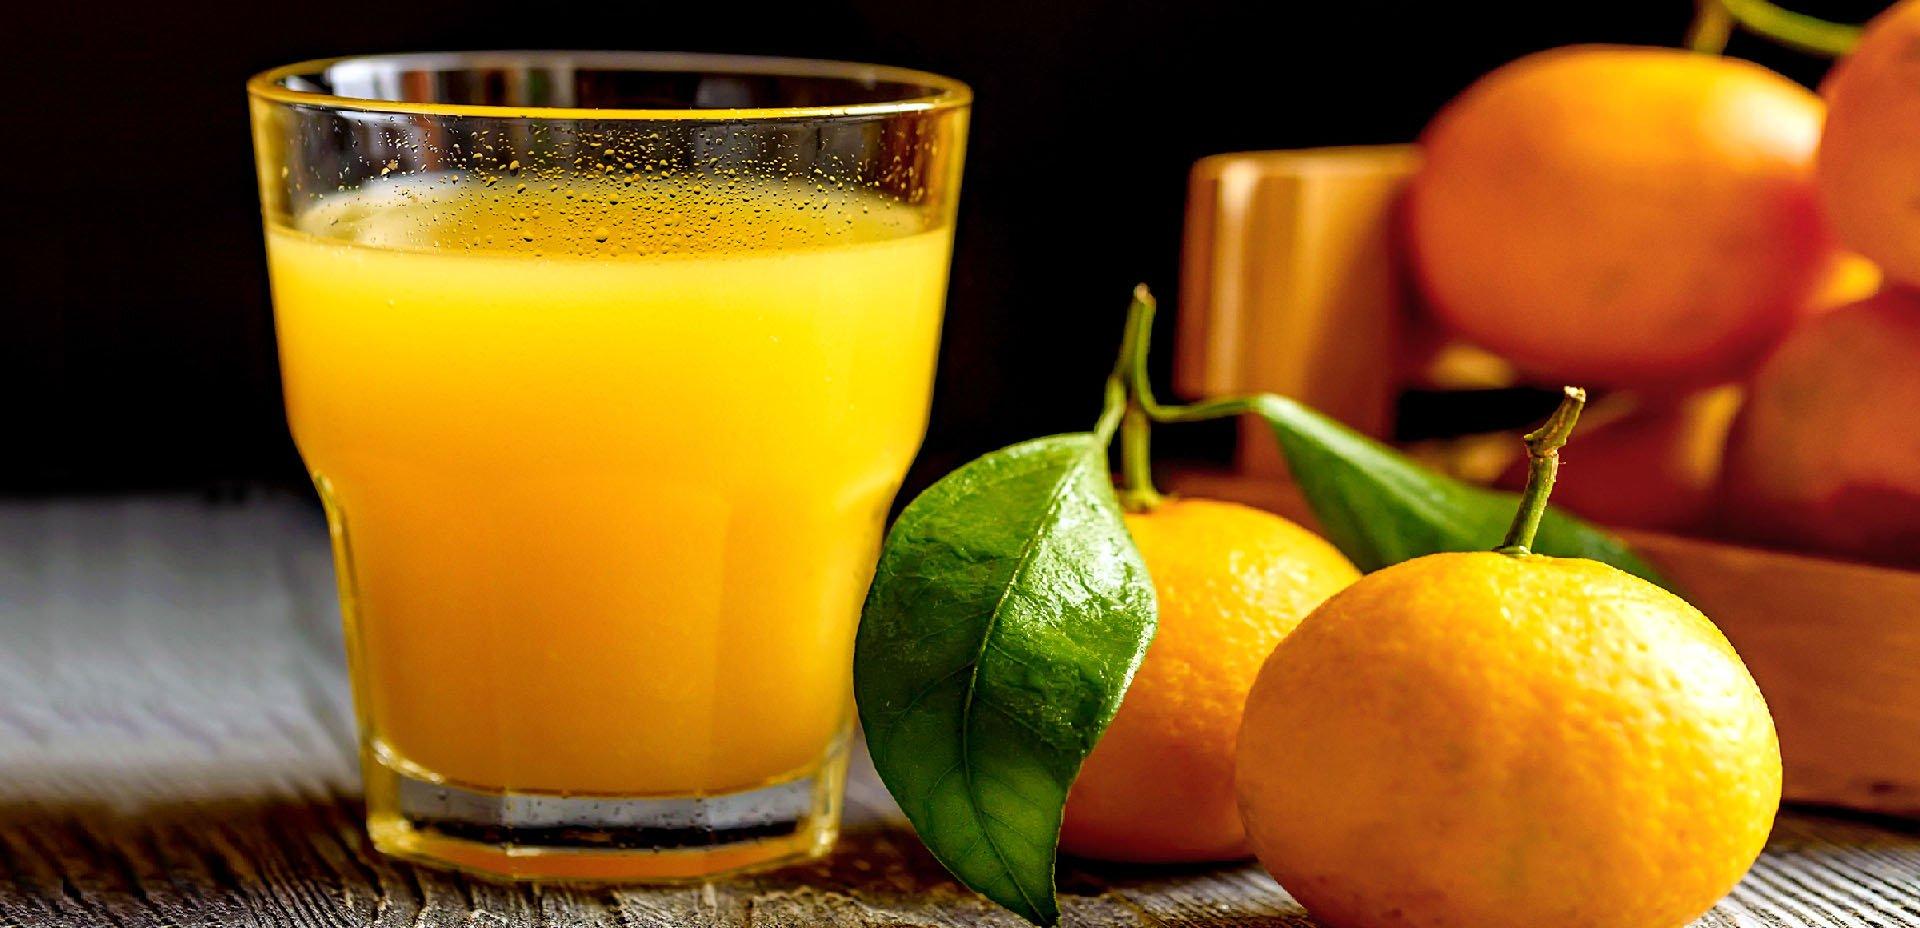 spremuta di mandarini